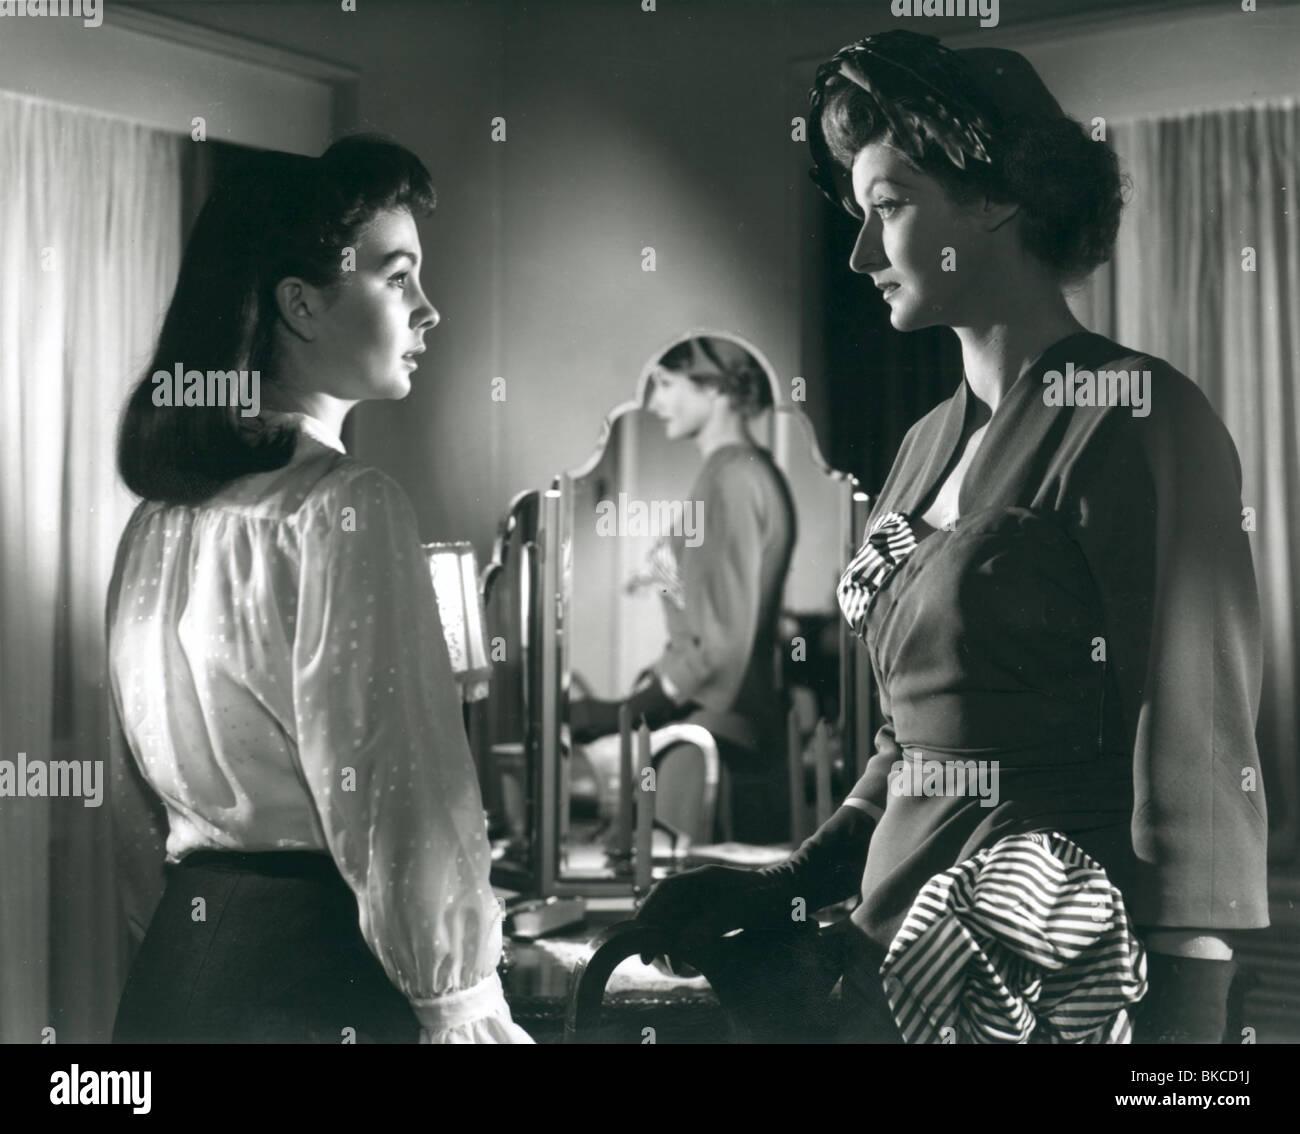 Janet Montgomery,Pauline Moore Erotic images Geraldine Villarruz Asis (b. 1965),Victoria Vinton